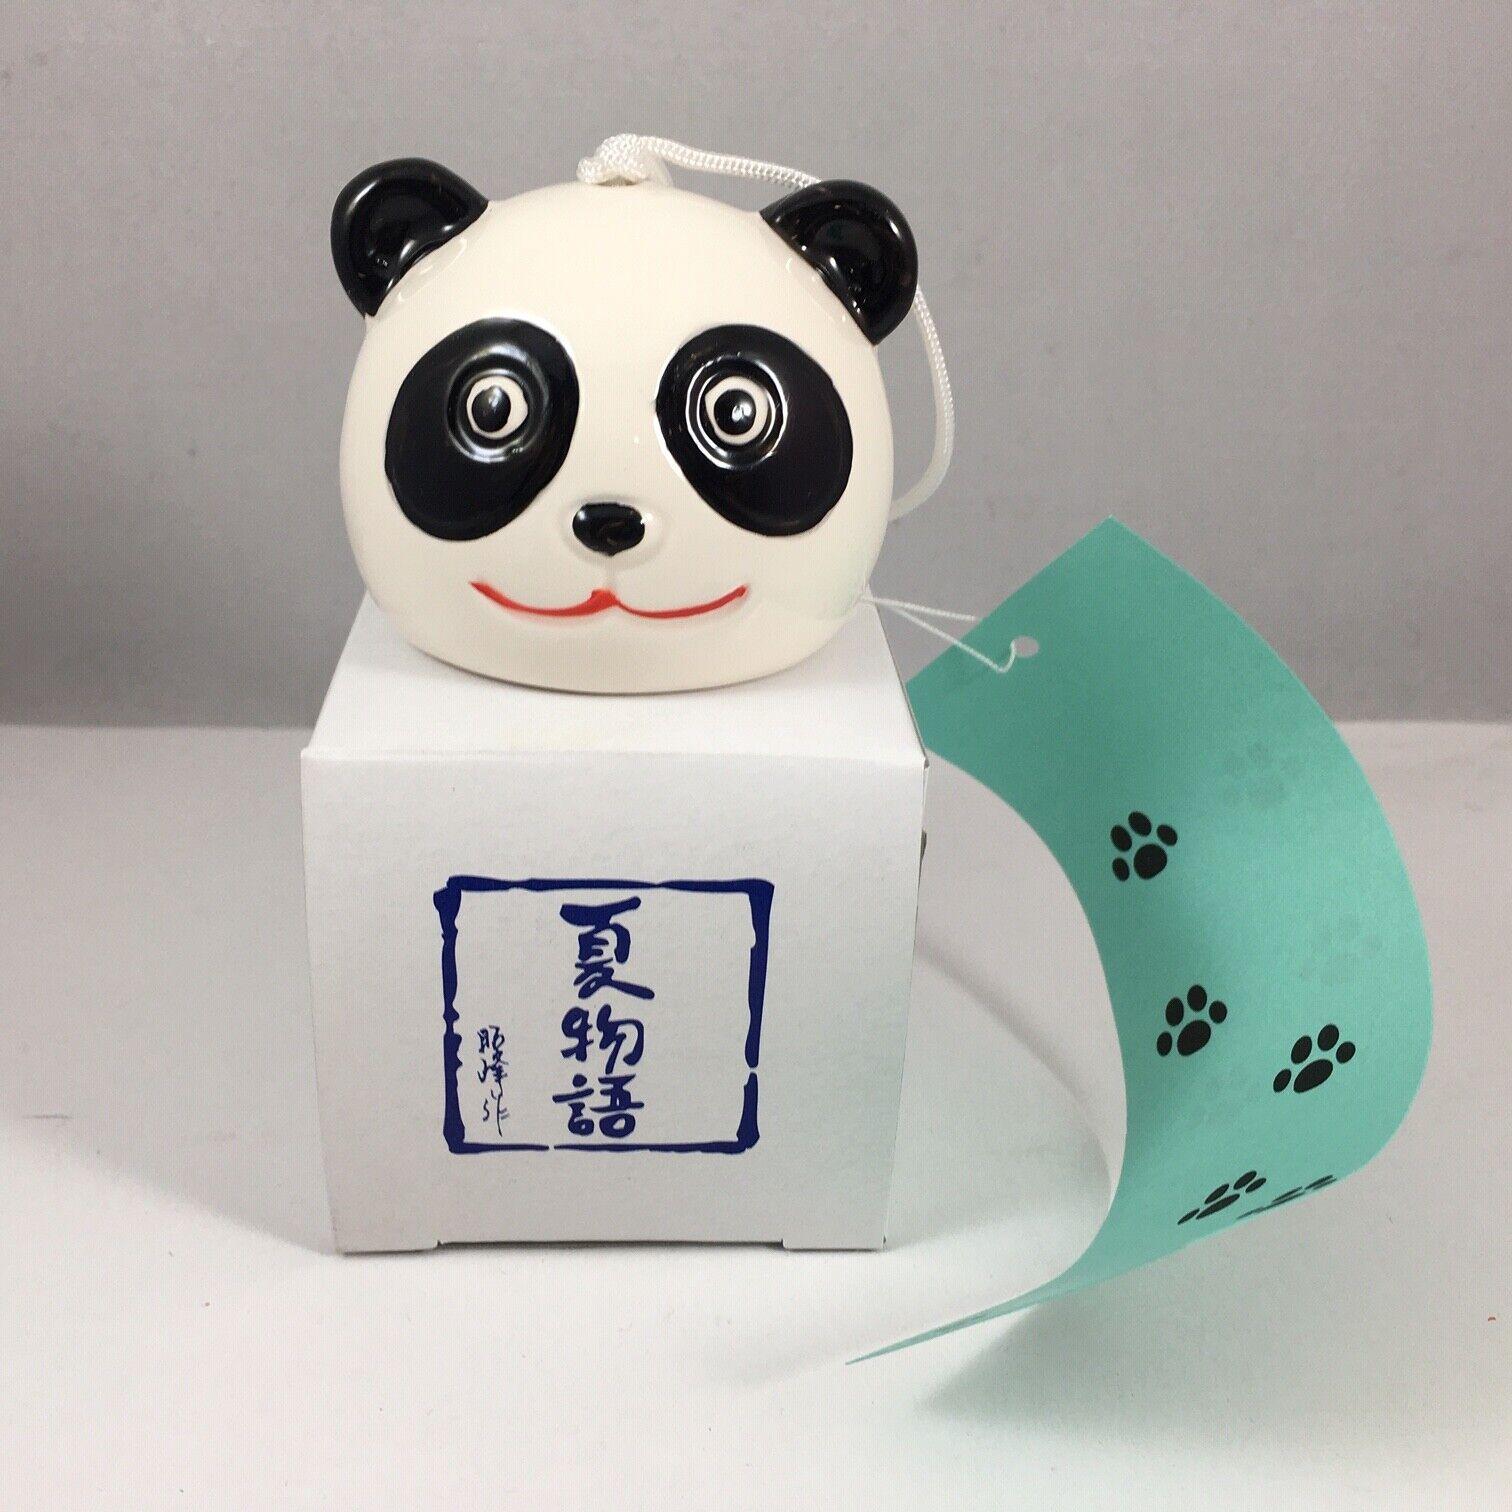 Kotobuki Japanese Ceramic Wind Chime Black White Panda Face #485-318 JAPAN MADE